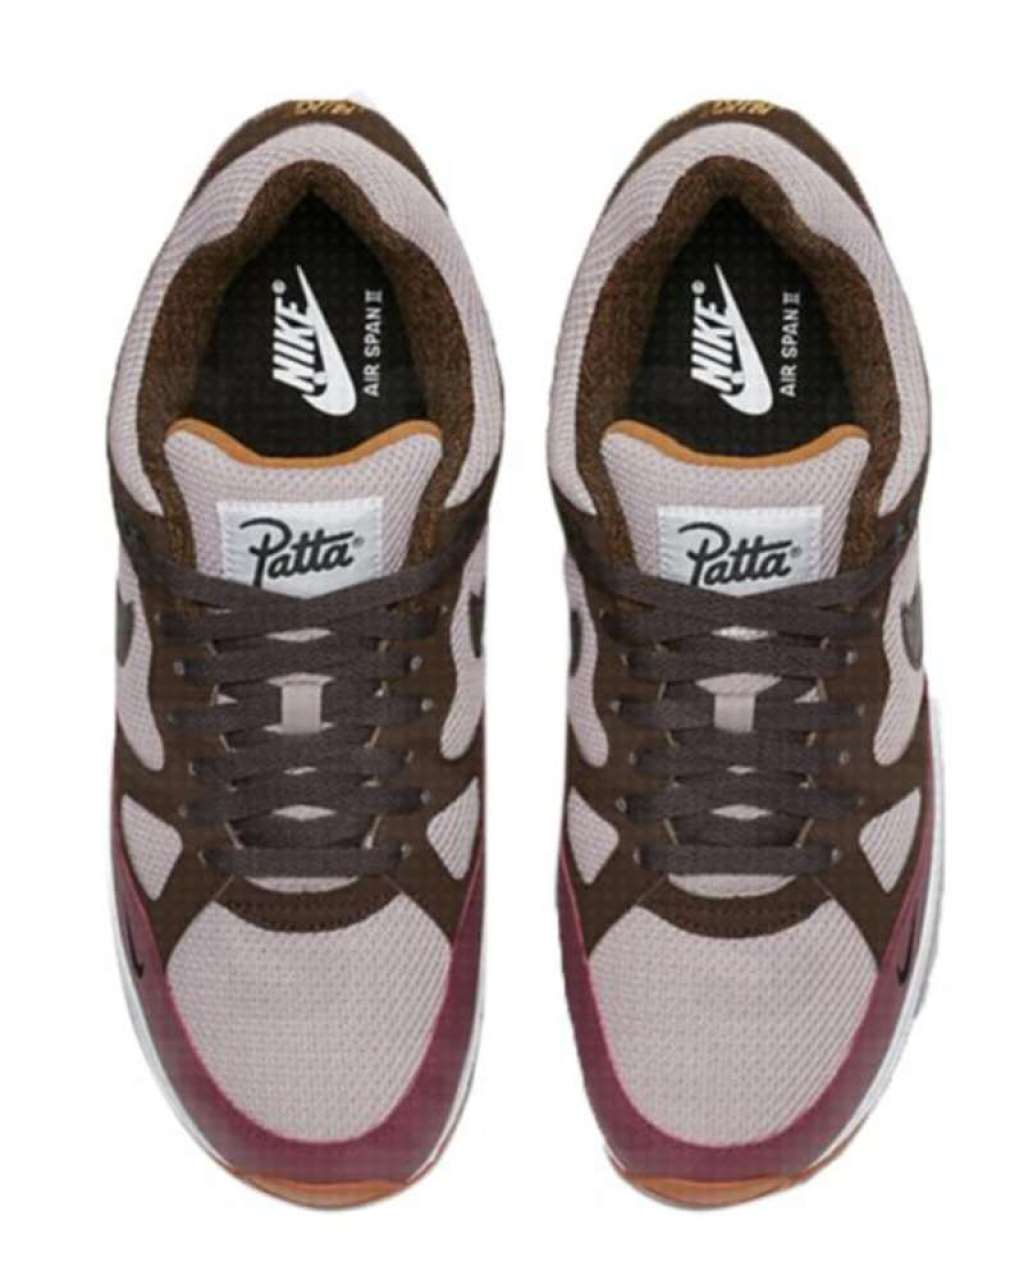 brand new 7ea74 b7cd8 ... Patta x Nike Air Span II